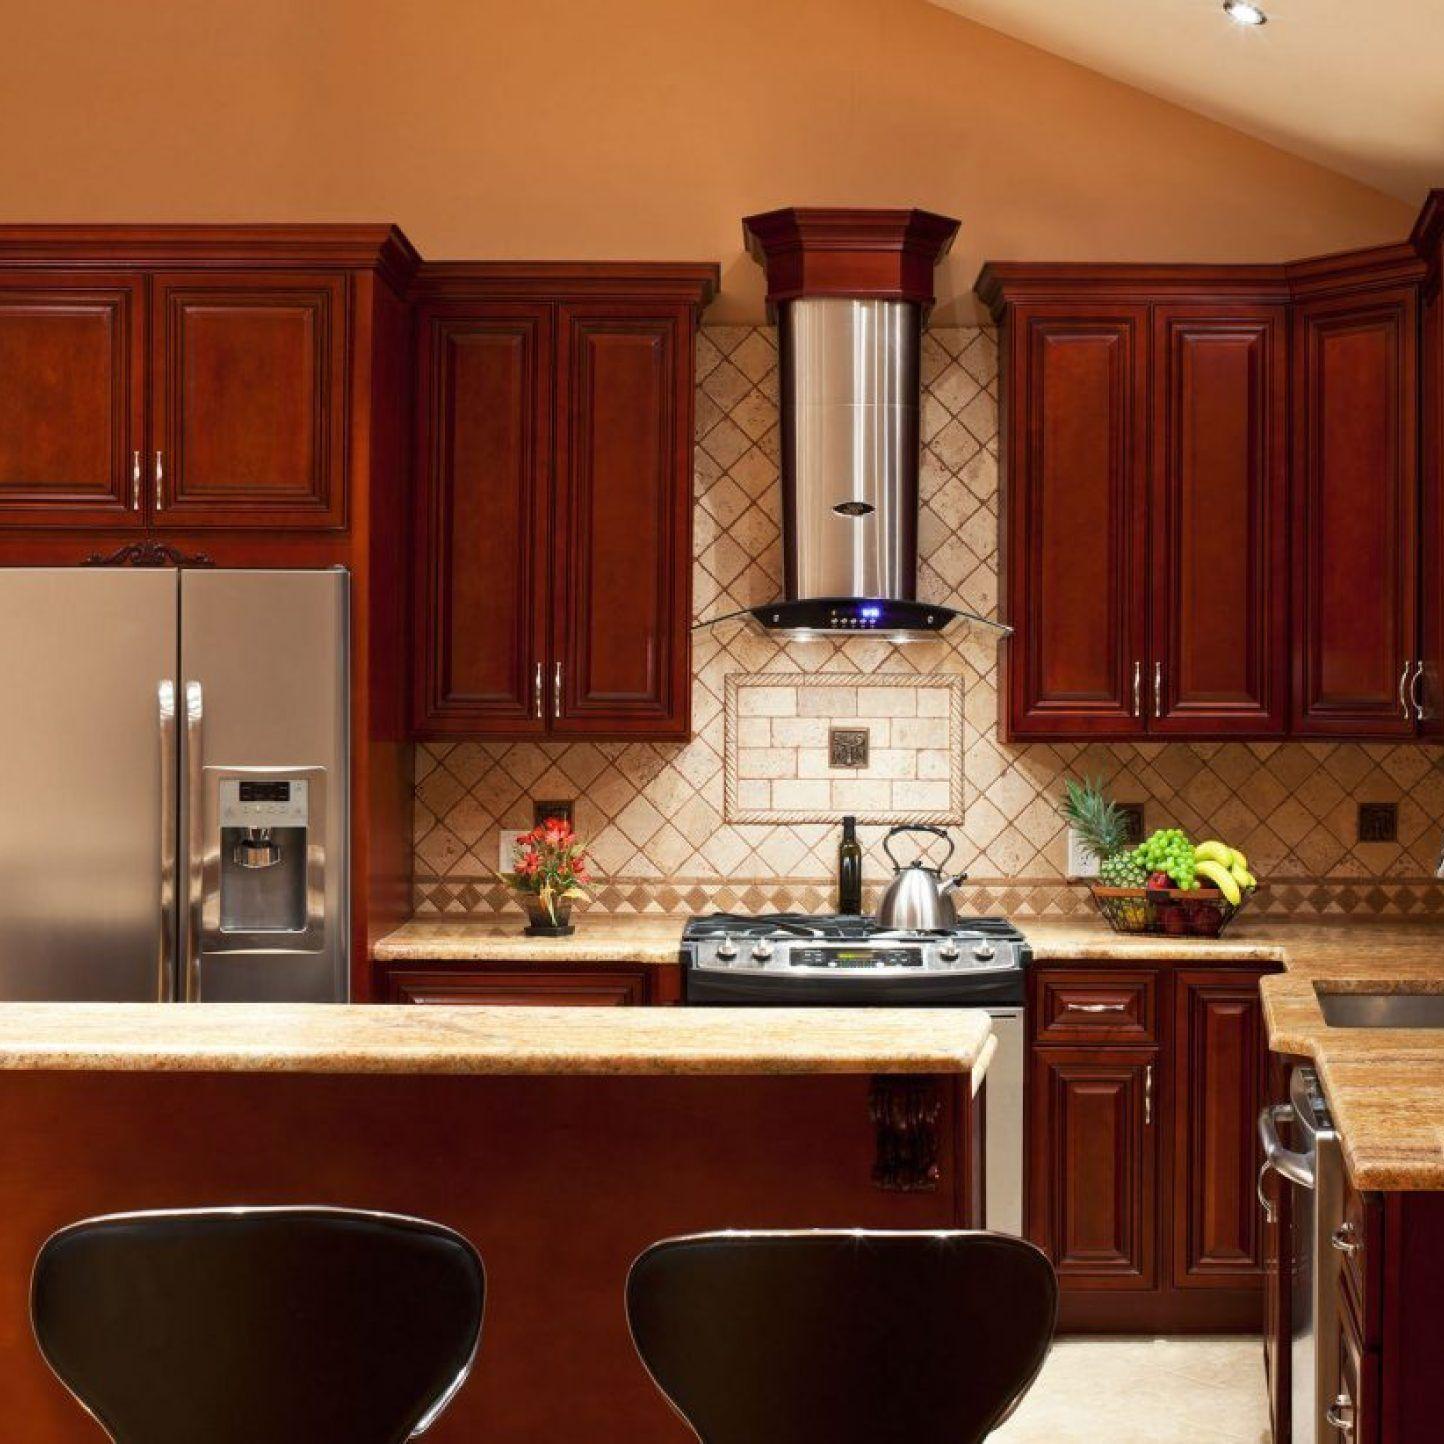 38 Buying Kitchen Backsplash With Dark Cabinets Light Granite